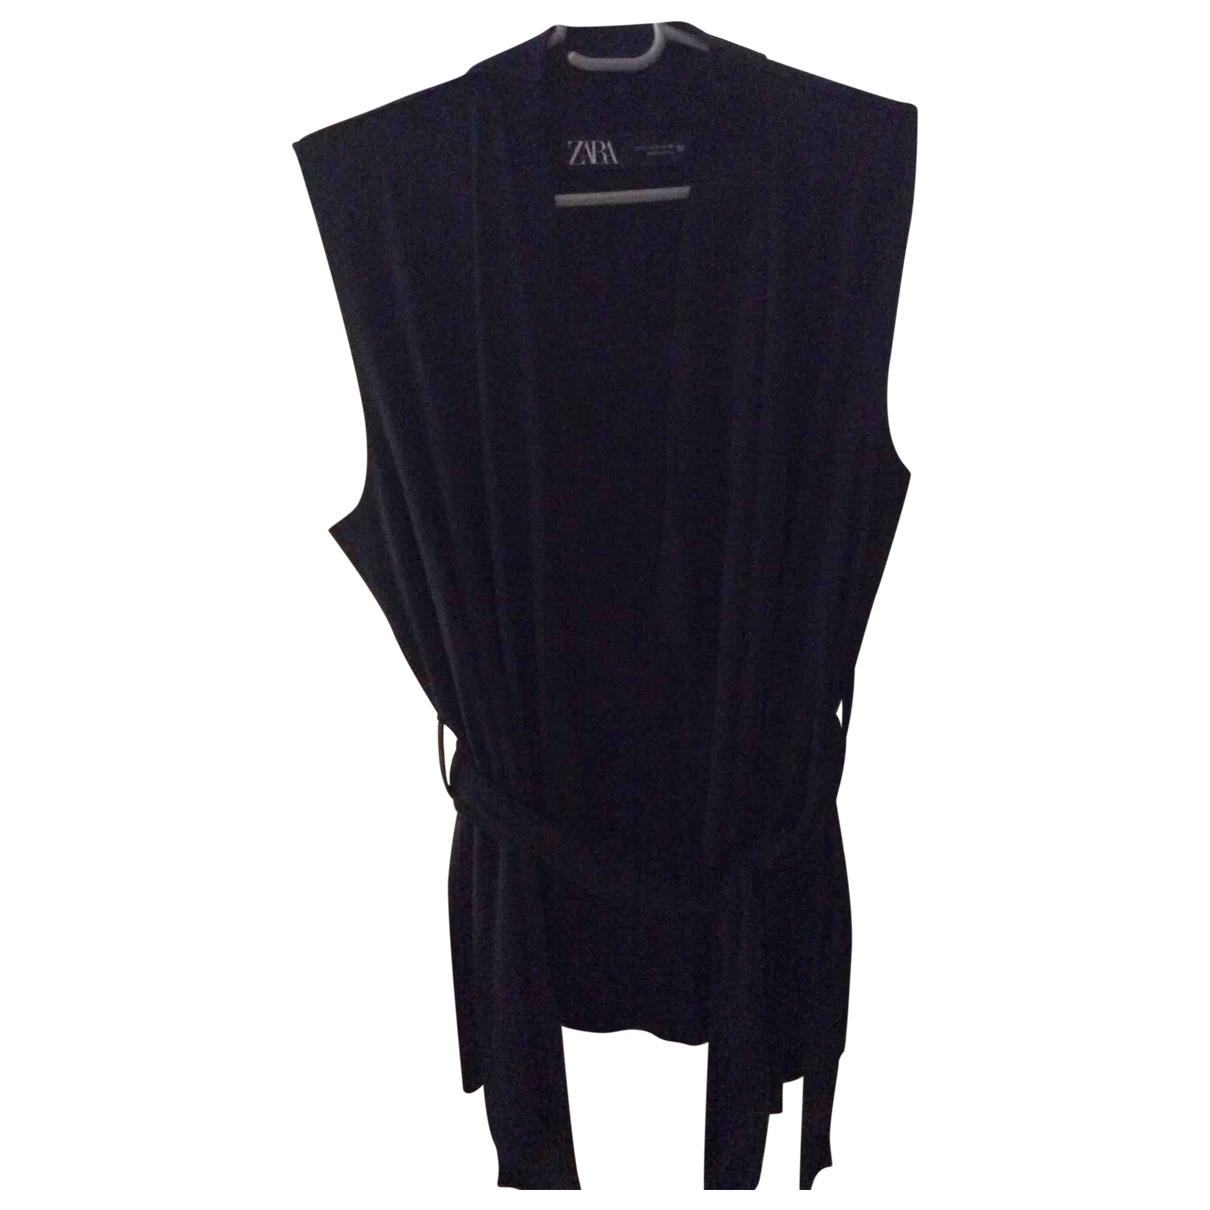 Zara - Pull   pour femme en suede - noir